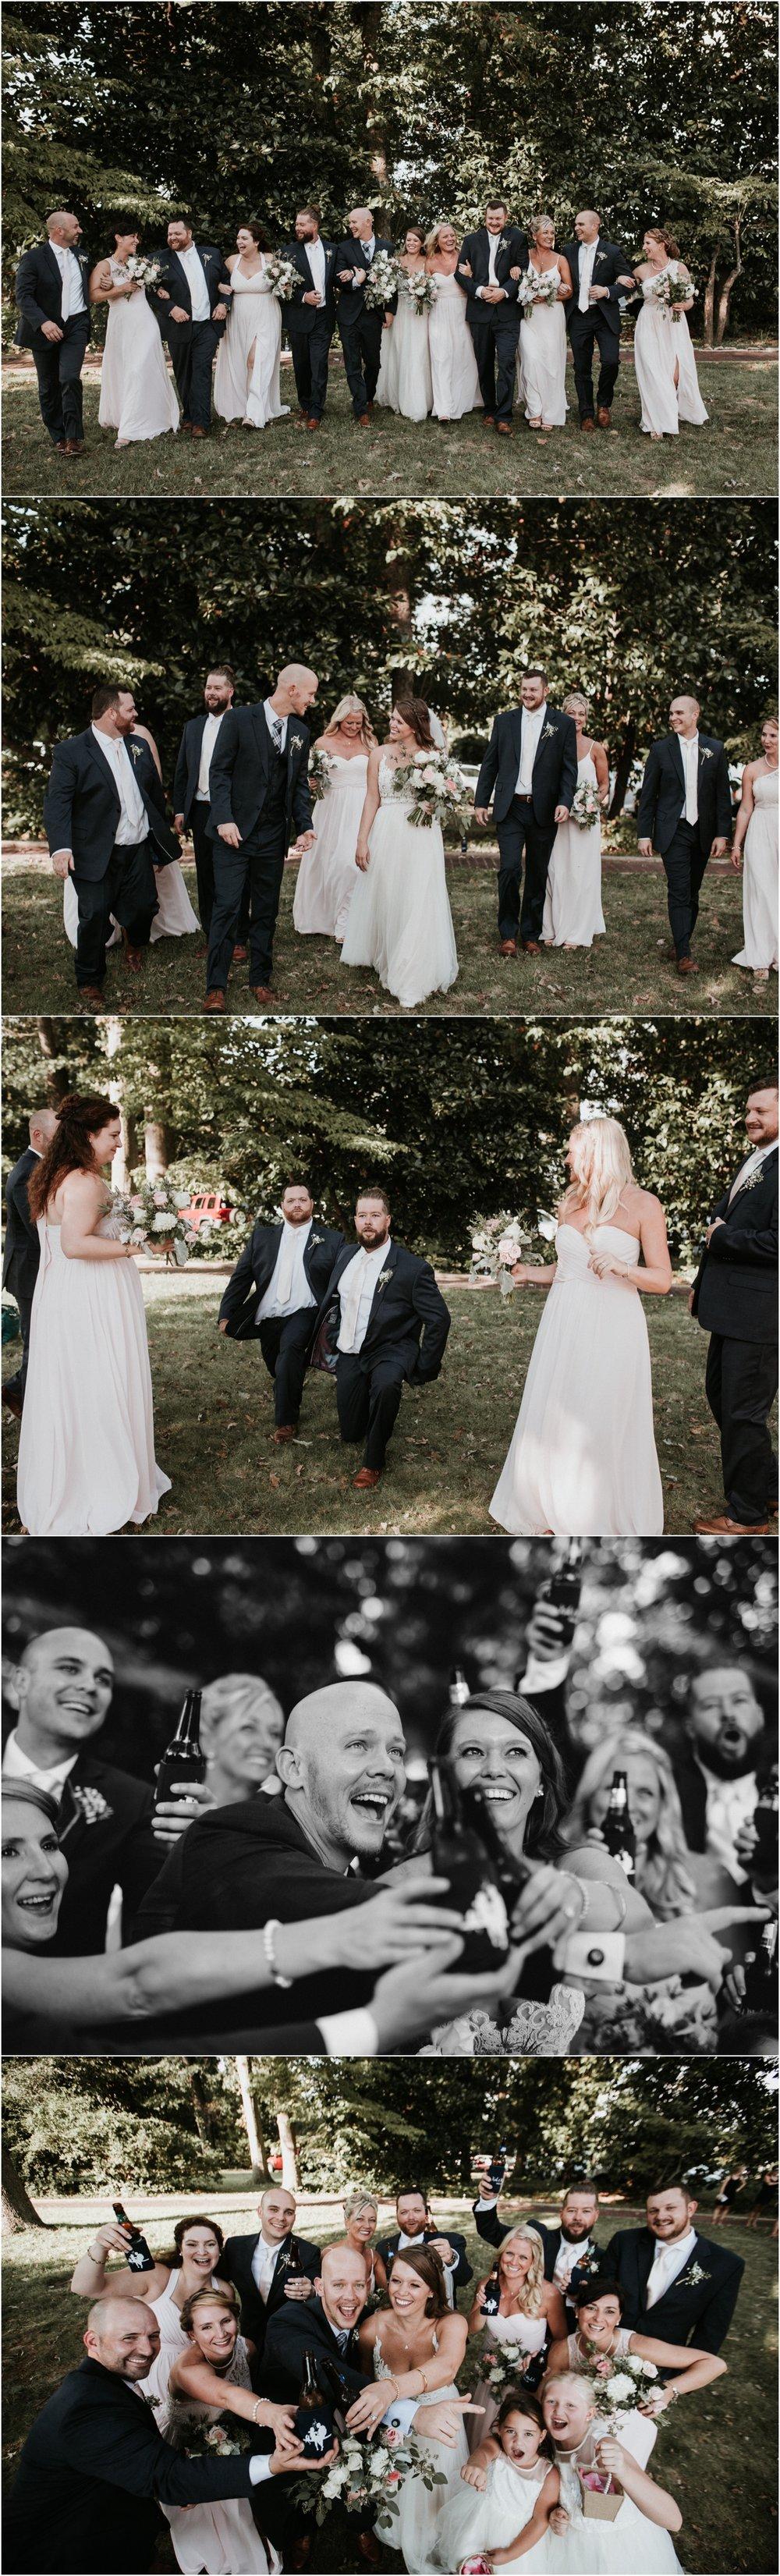 Stowe-manor-wedding-belmont-nc_0041.jpg